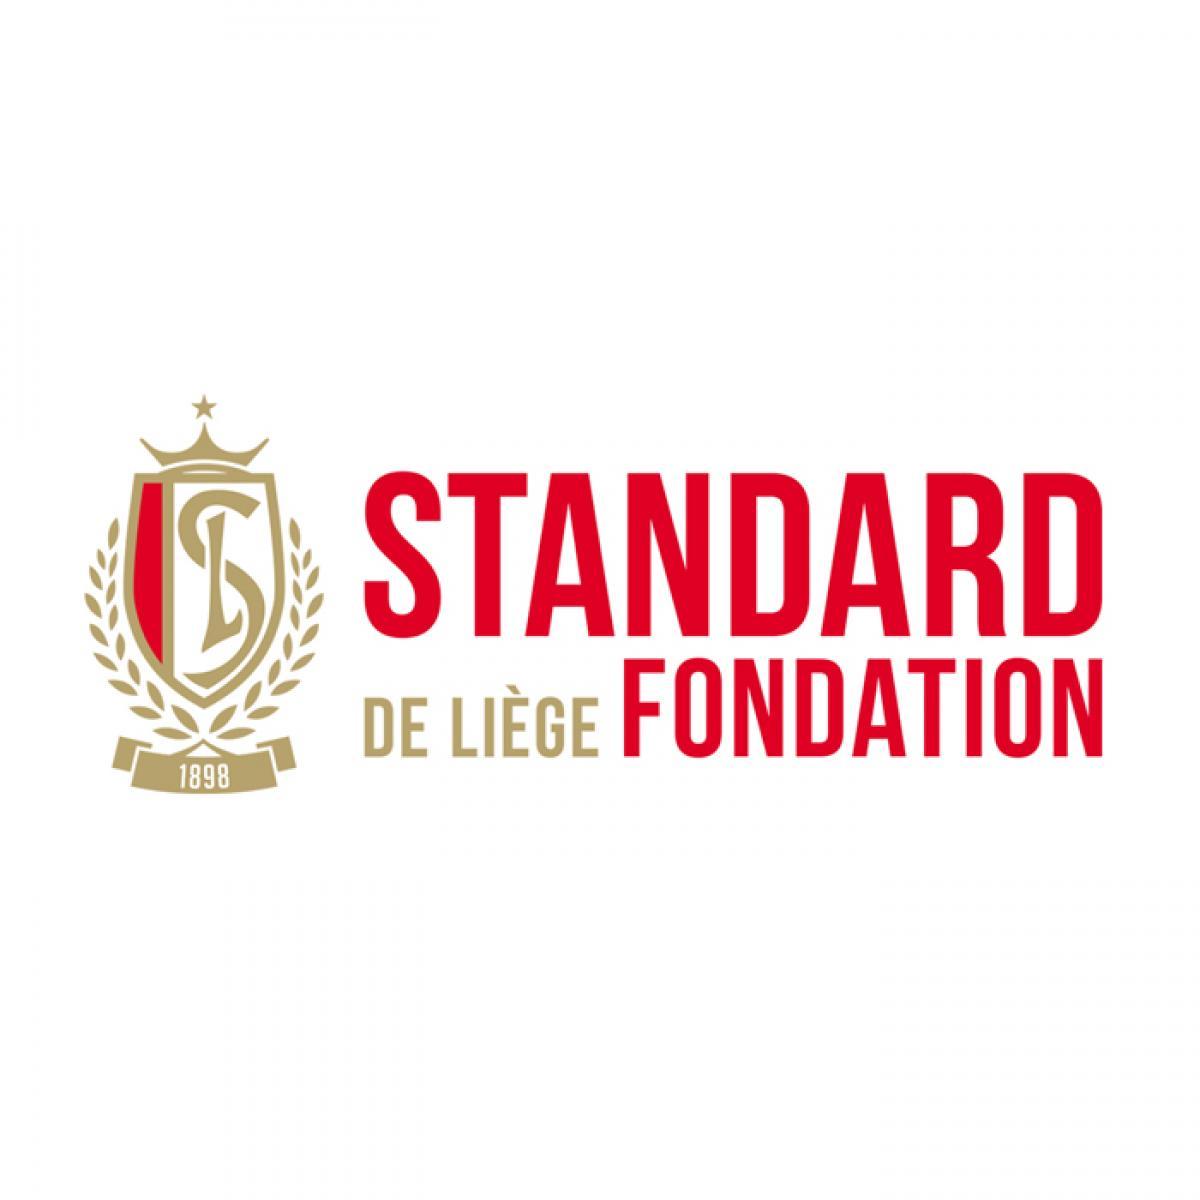 La Fondation Standard de Liège